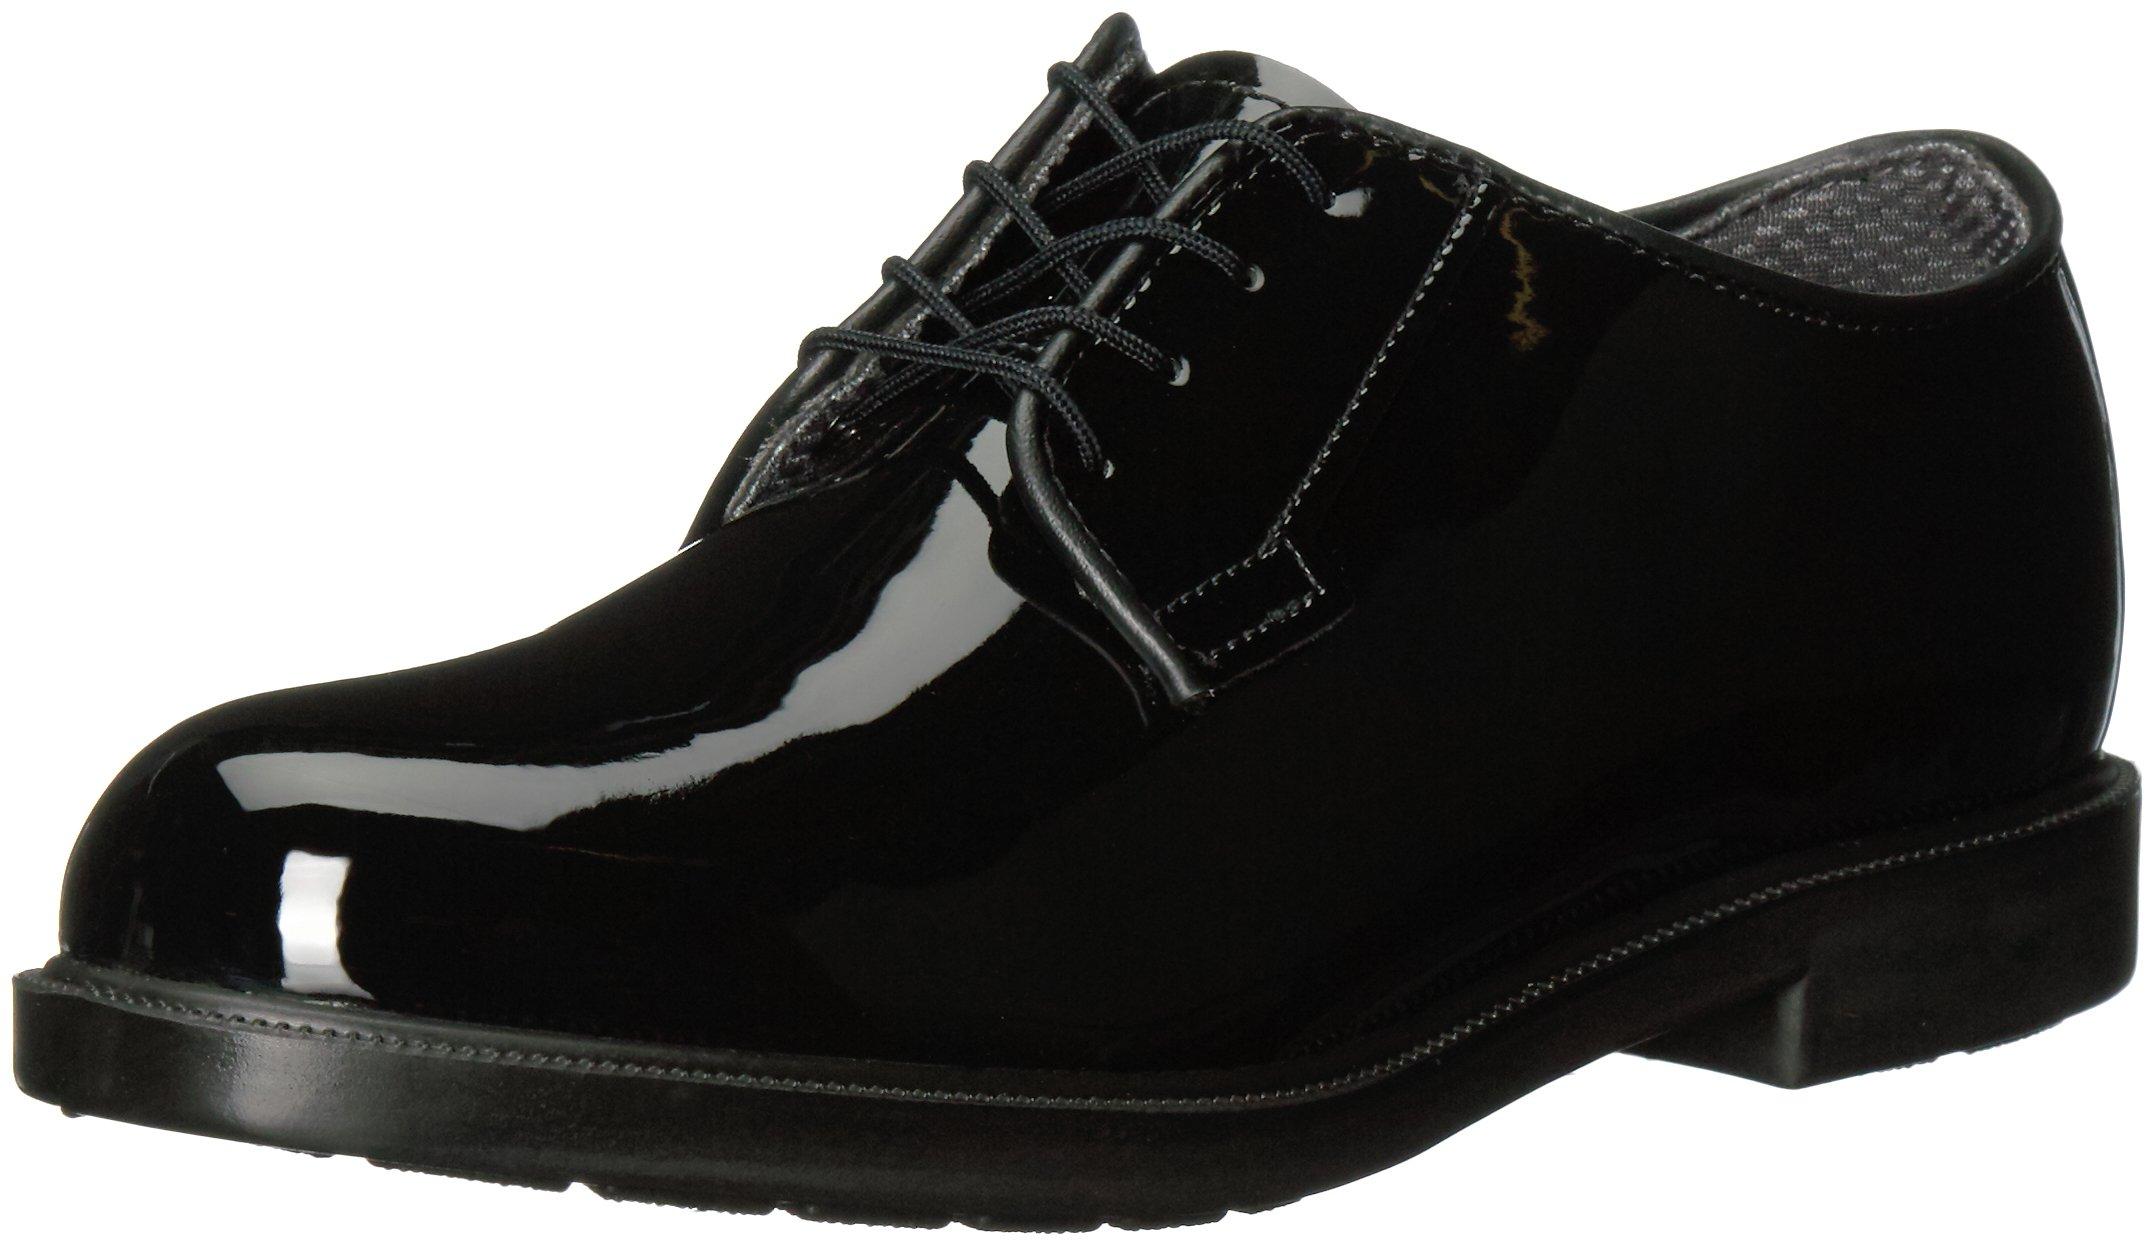 Bates Women's High Gloss Durashocks Shoe,Black,6 M US by Bates